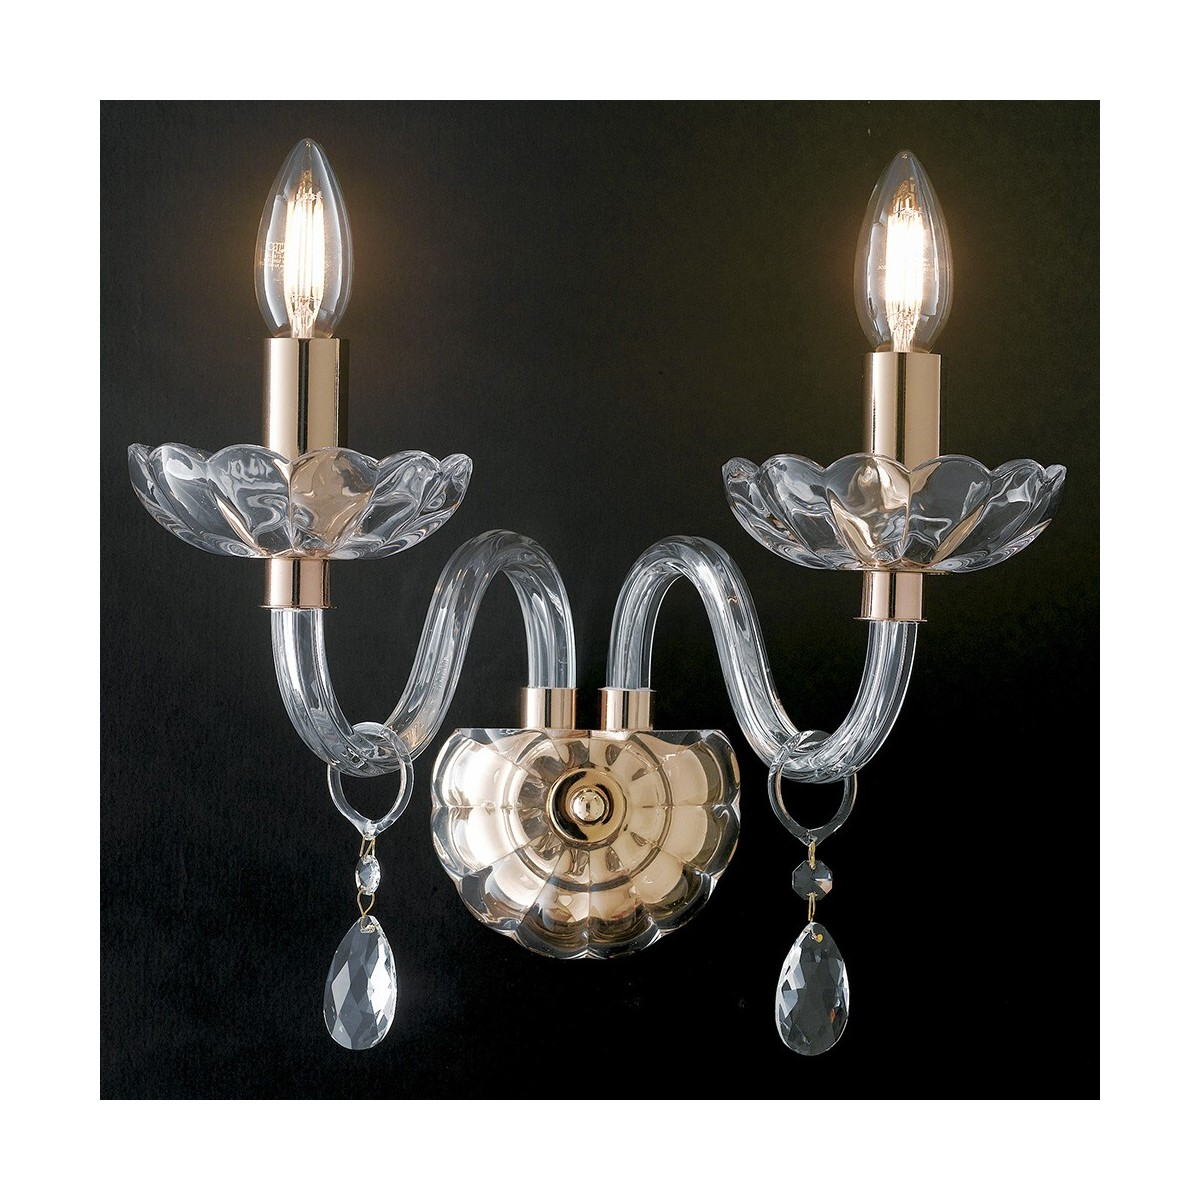 I-RIFLESSO / AP2 ORO - Applique Cristal Finition Or Gouttes Applique Murale Classique Transparente E14